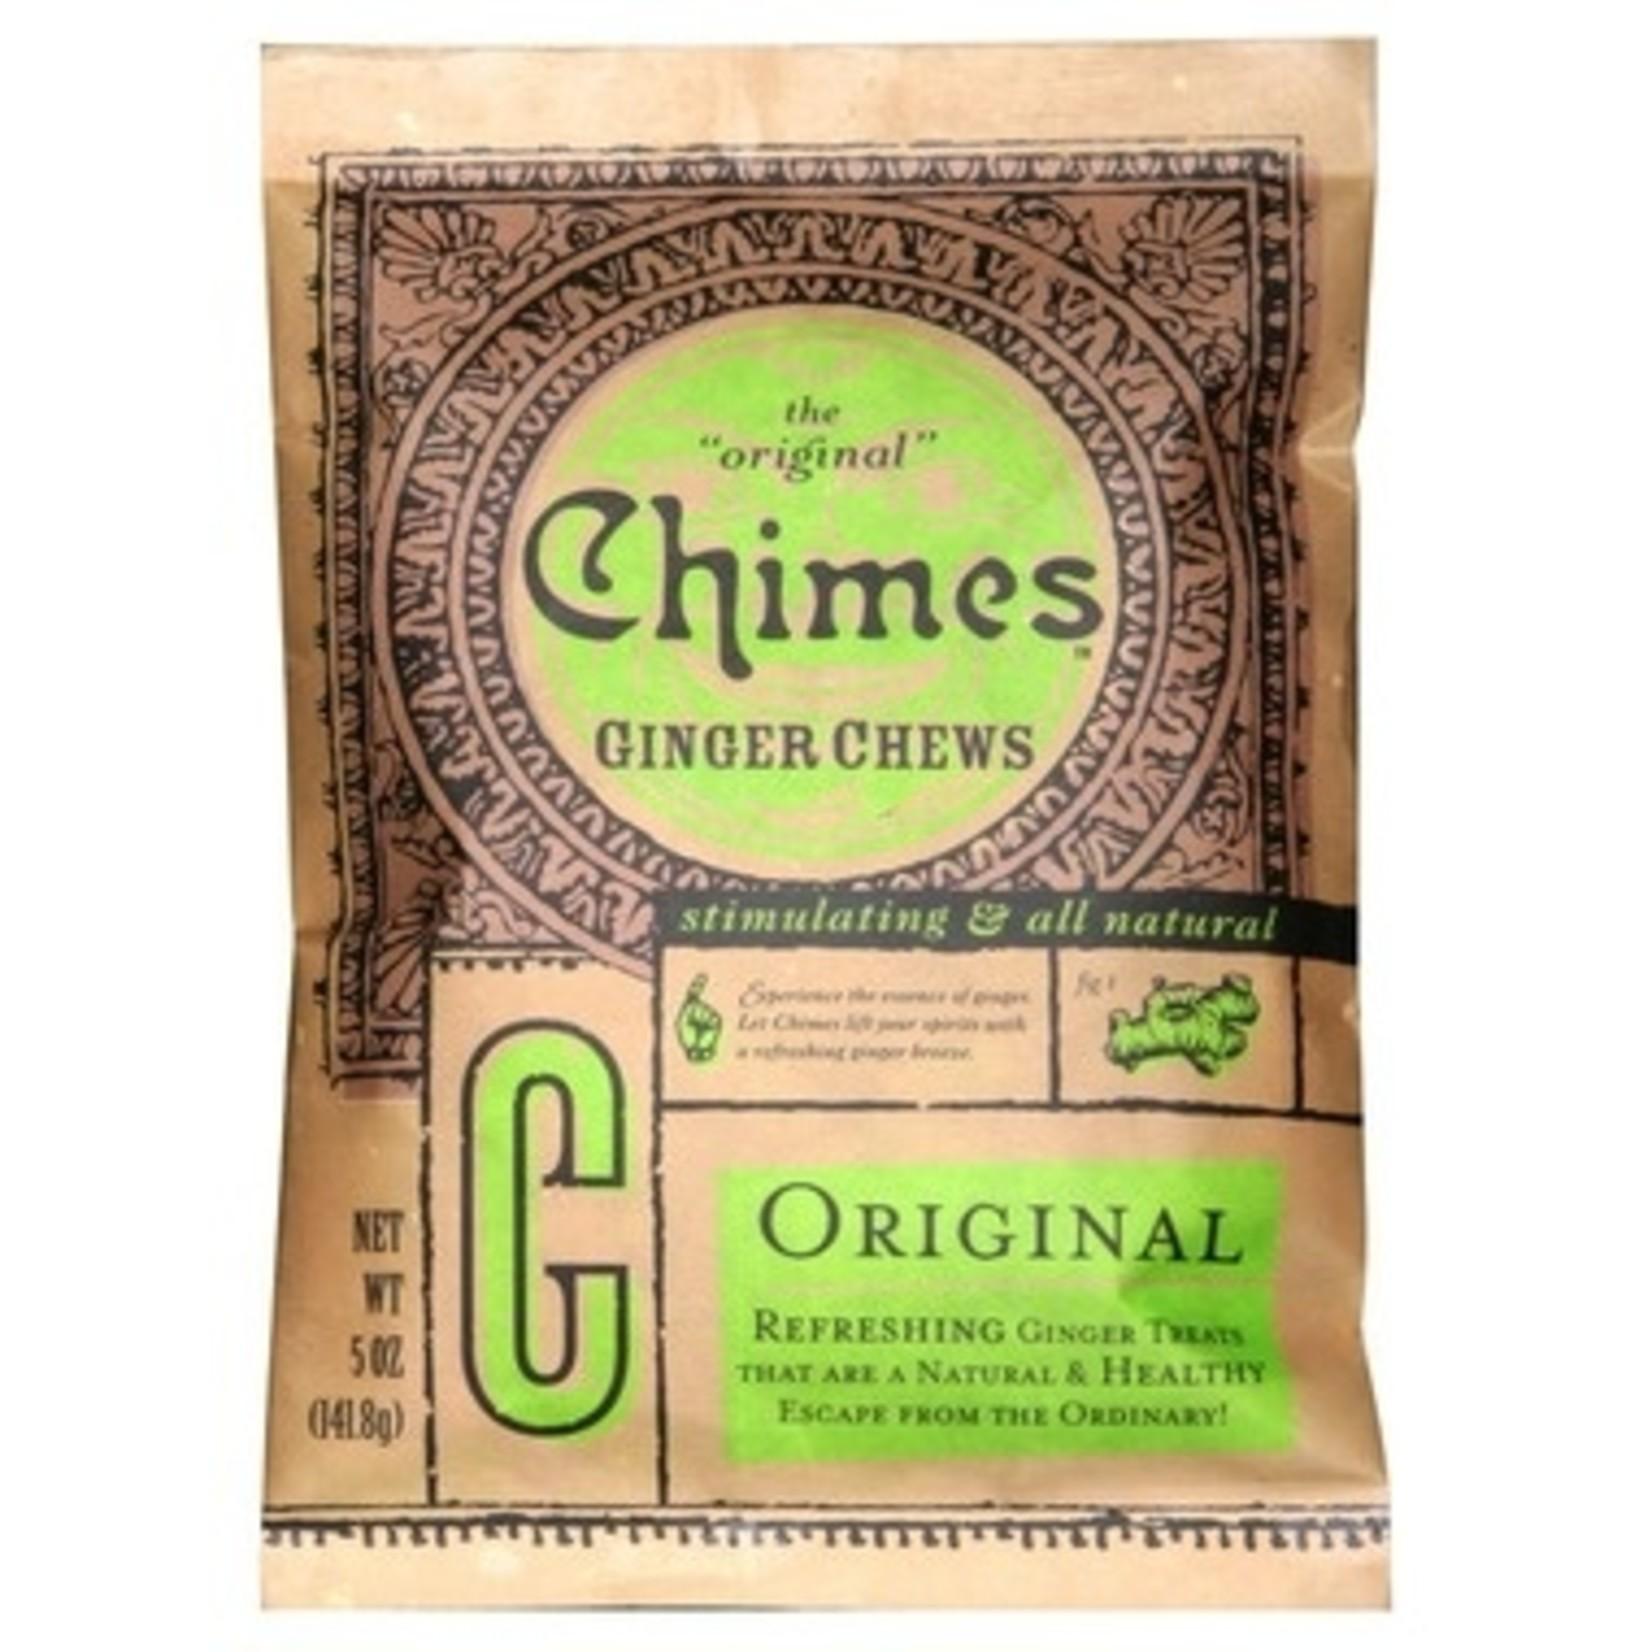 Chimes Ginger Chew Original 141g bag